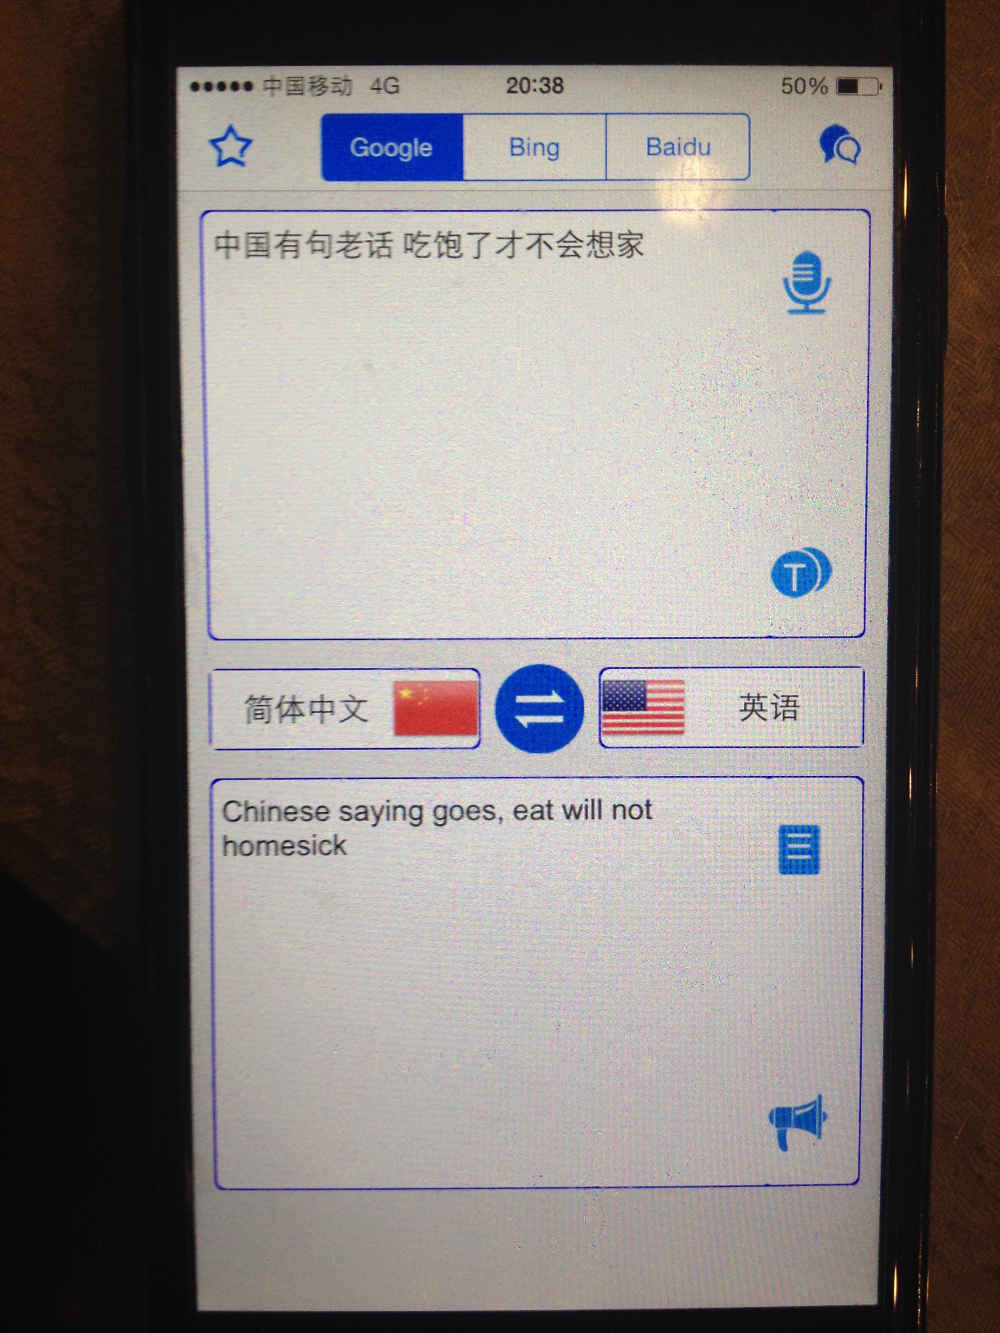 Chinese saying